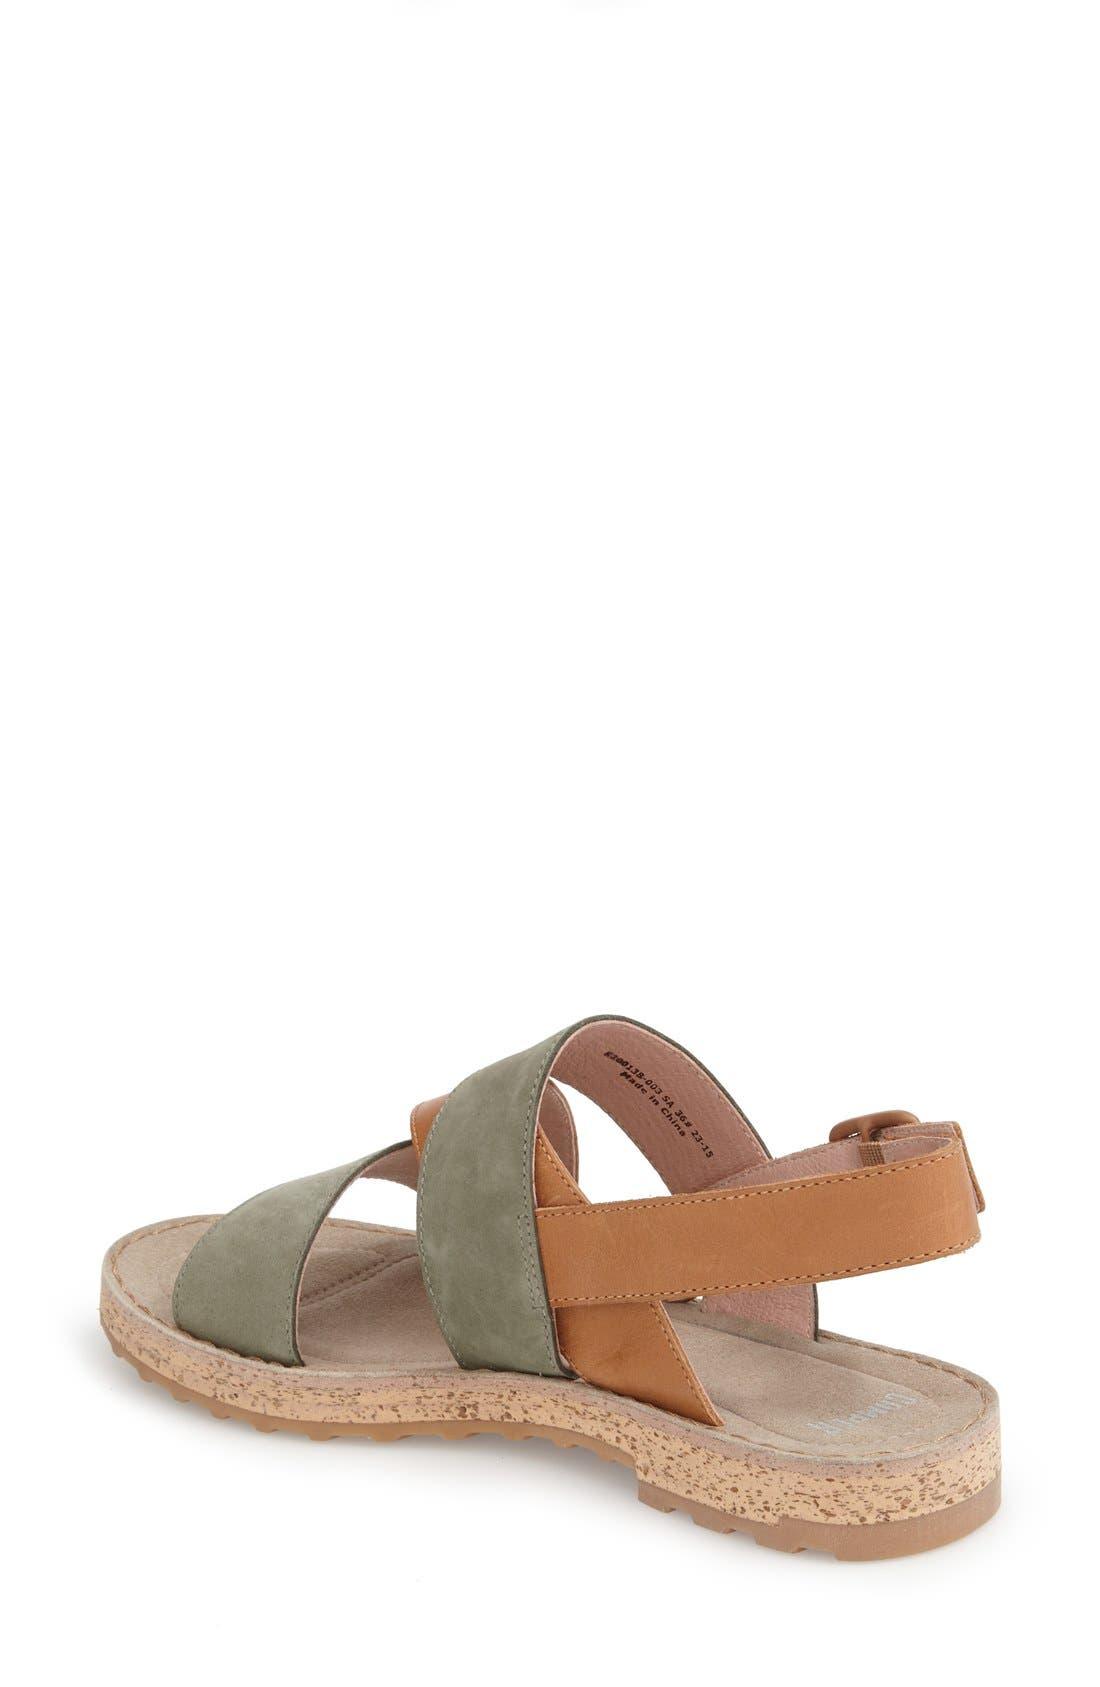 Alternate Image 2  - Camper 'Pimpom' Leather & Suede Crisscross Strap Sandal (Women)